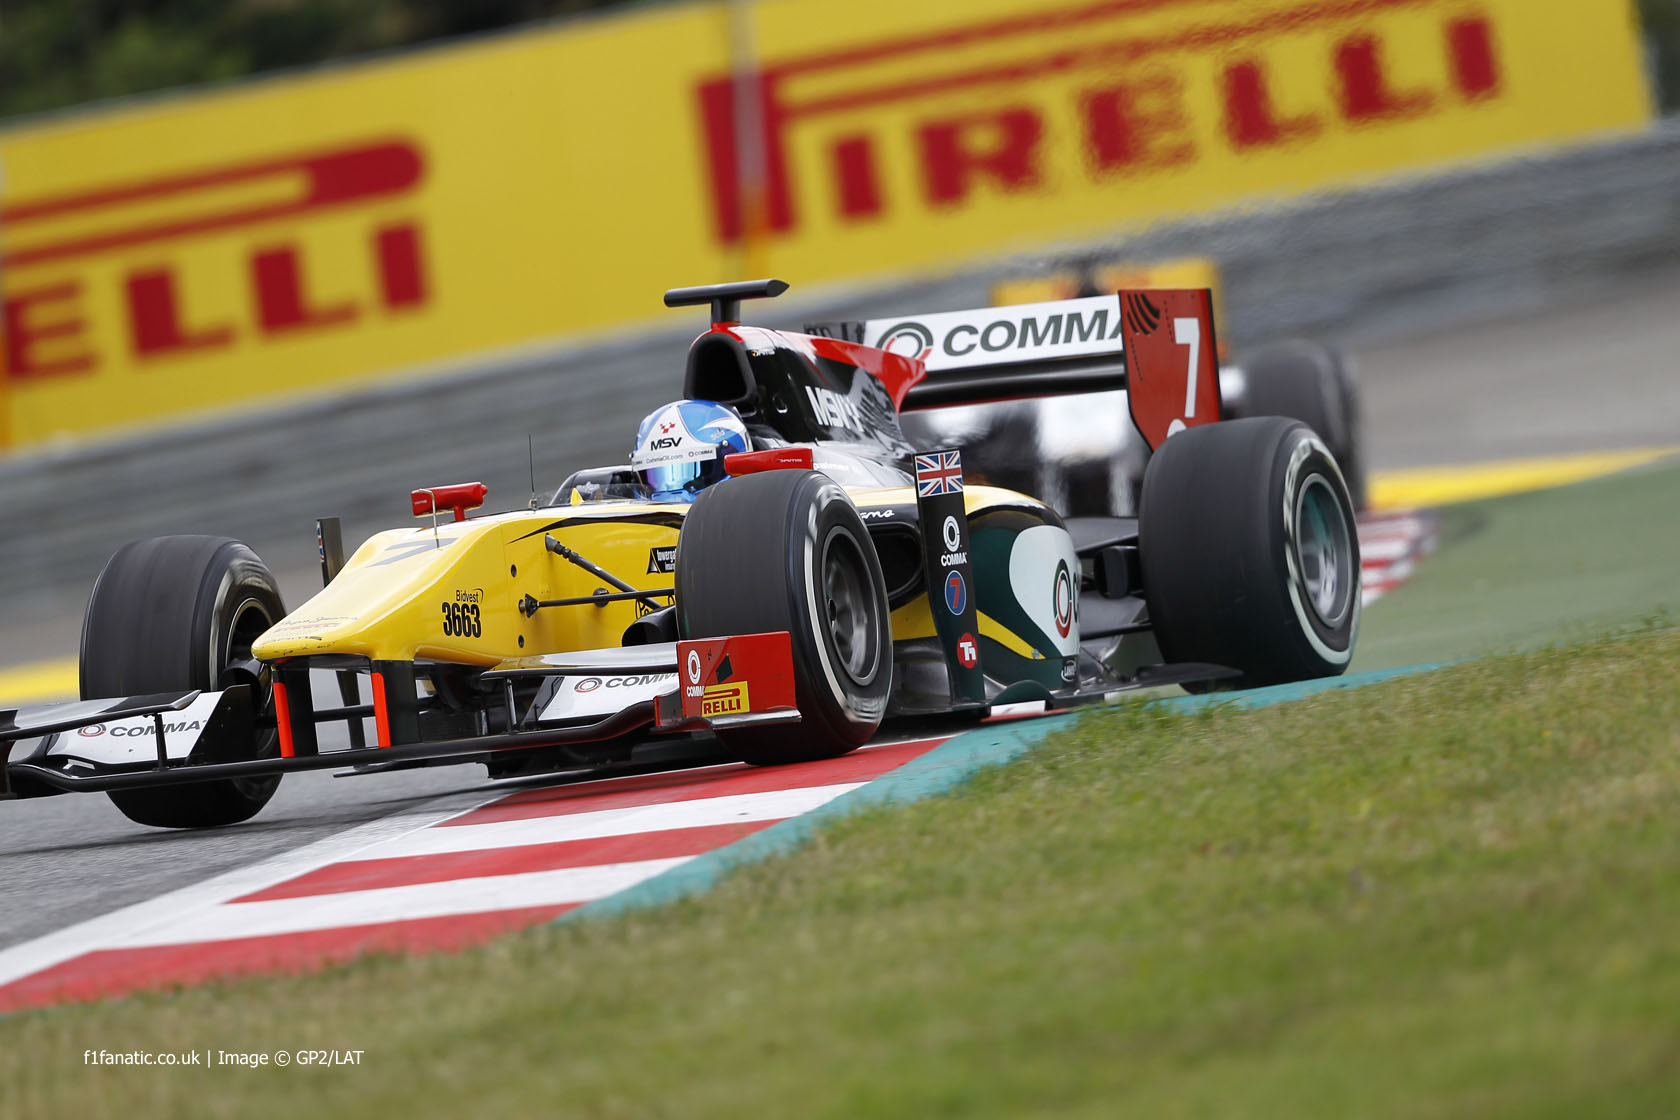 Jolyon Palmer, DAMS, GP2, Red Bull Ring, 2014, 2